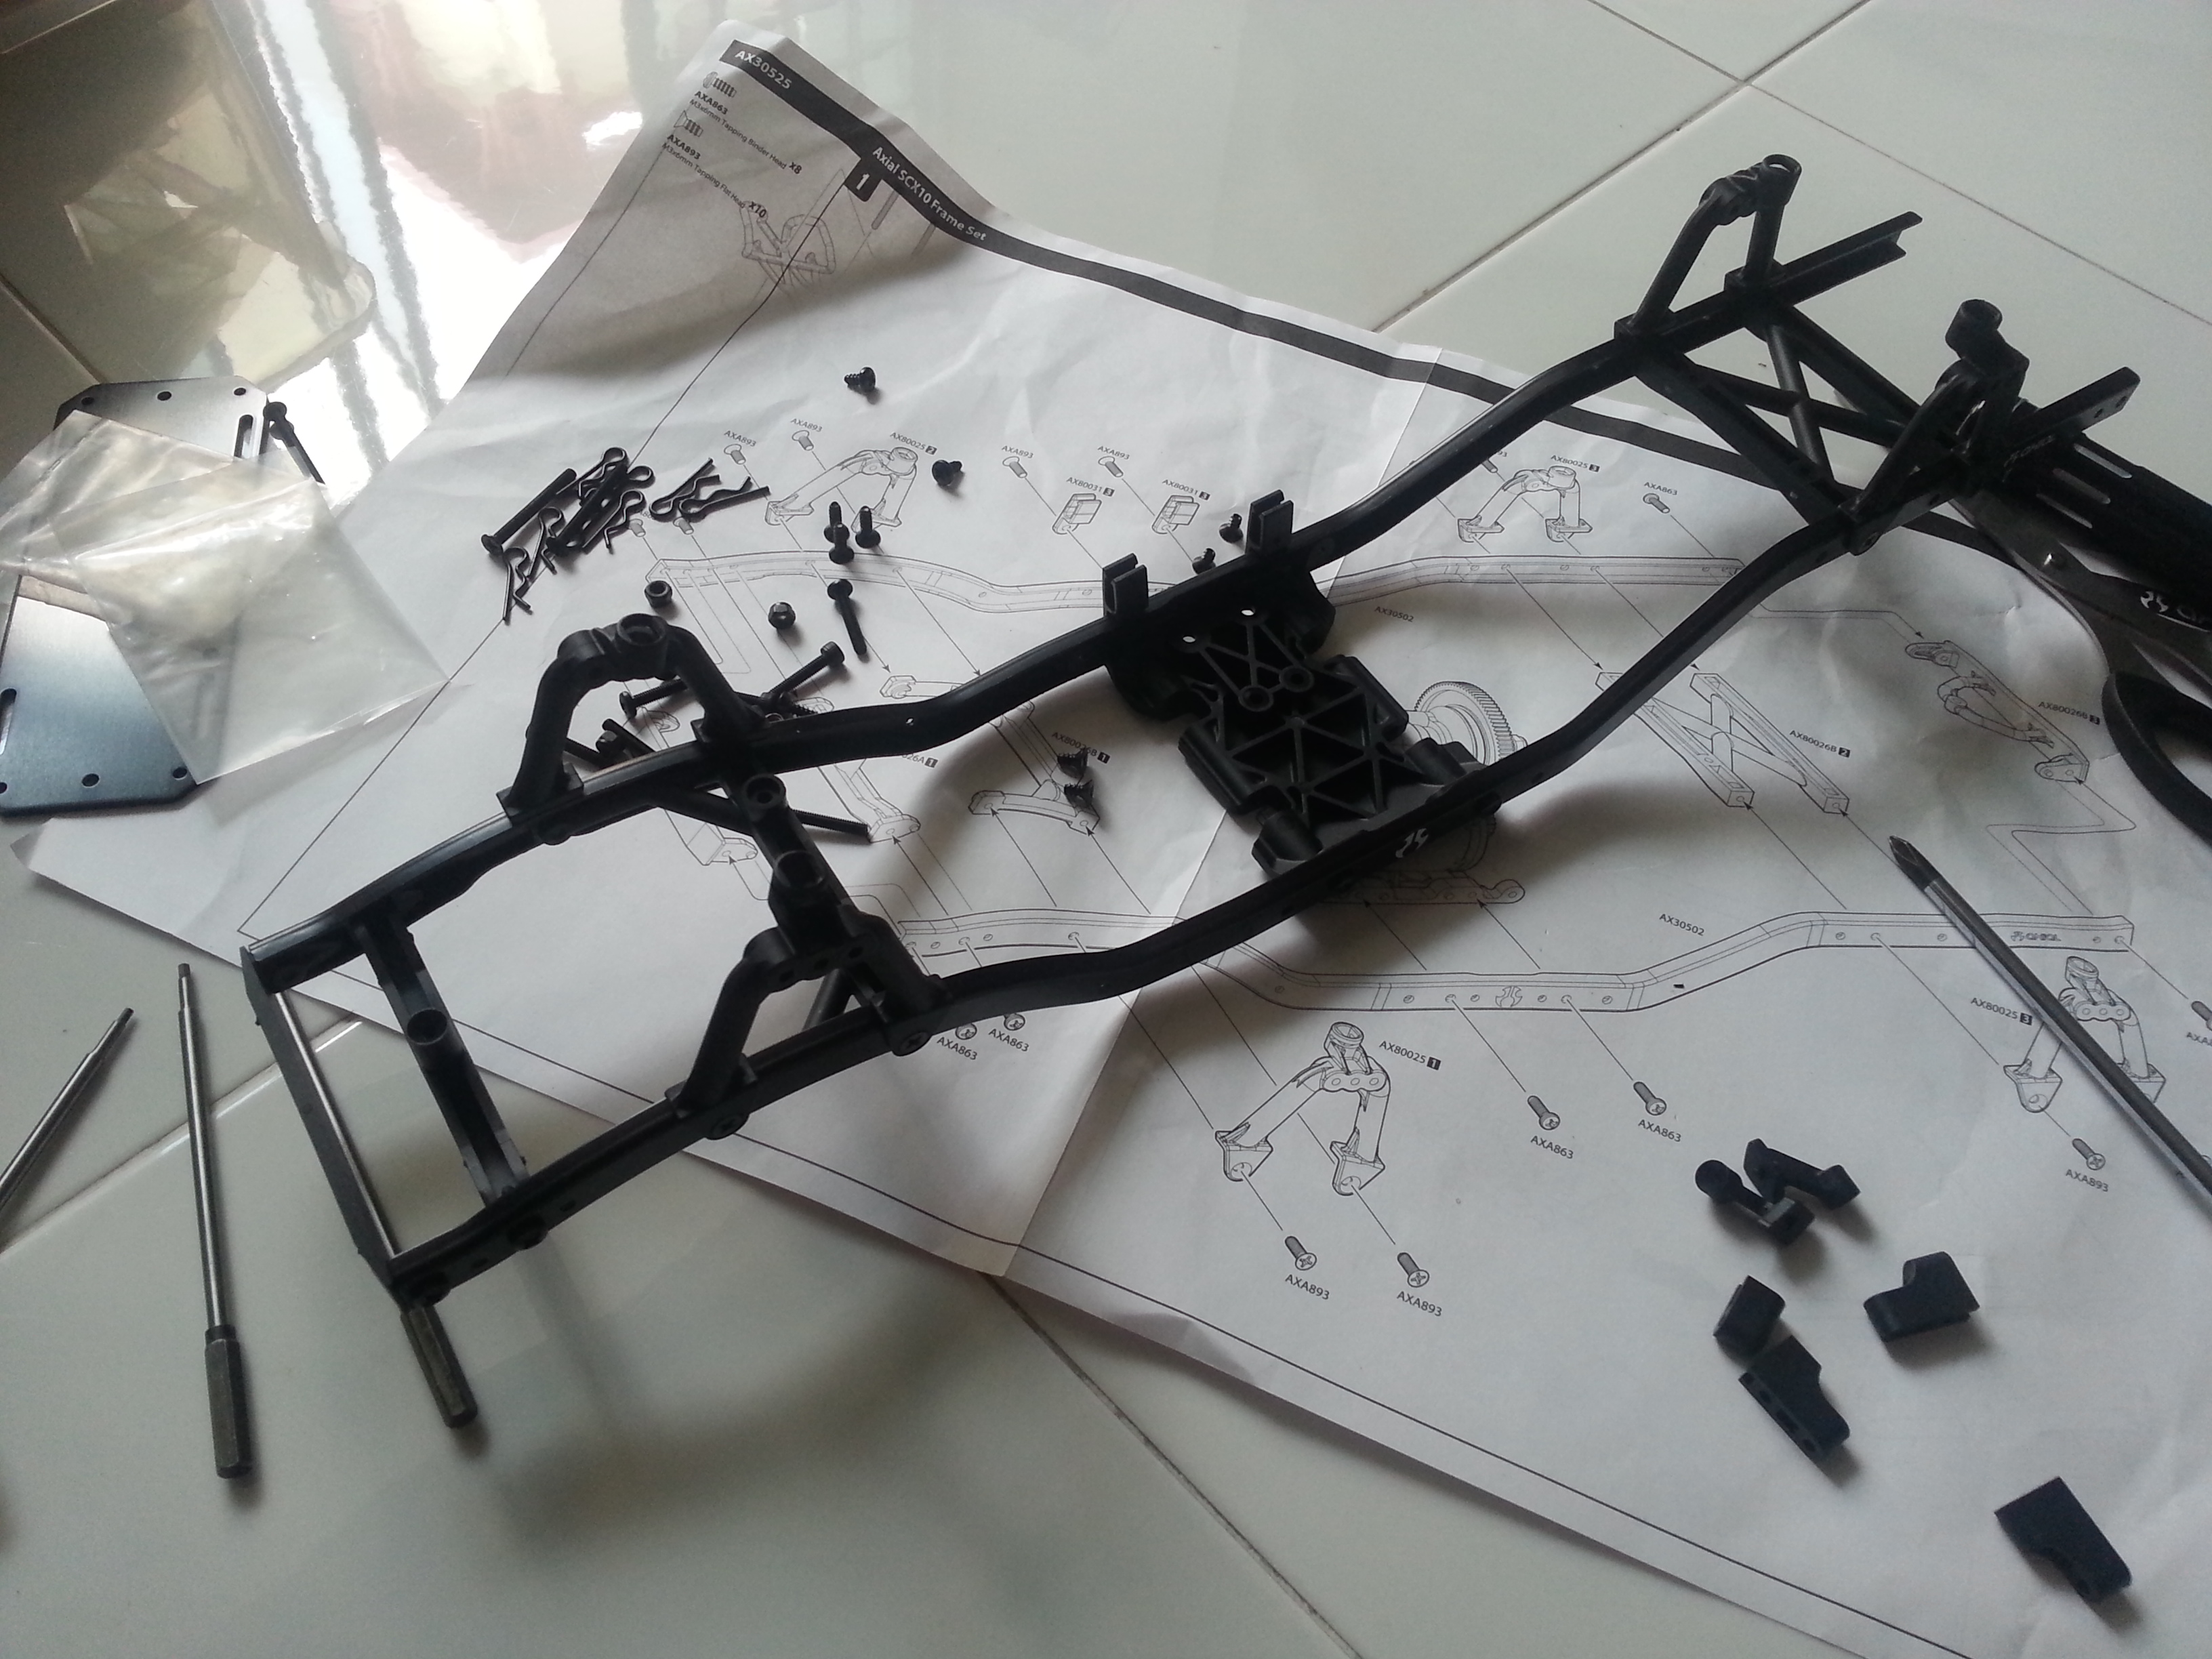 build - Babyboy's first 6x6 build 15154362814_6a0ff7c8a2_o